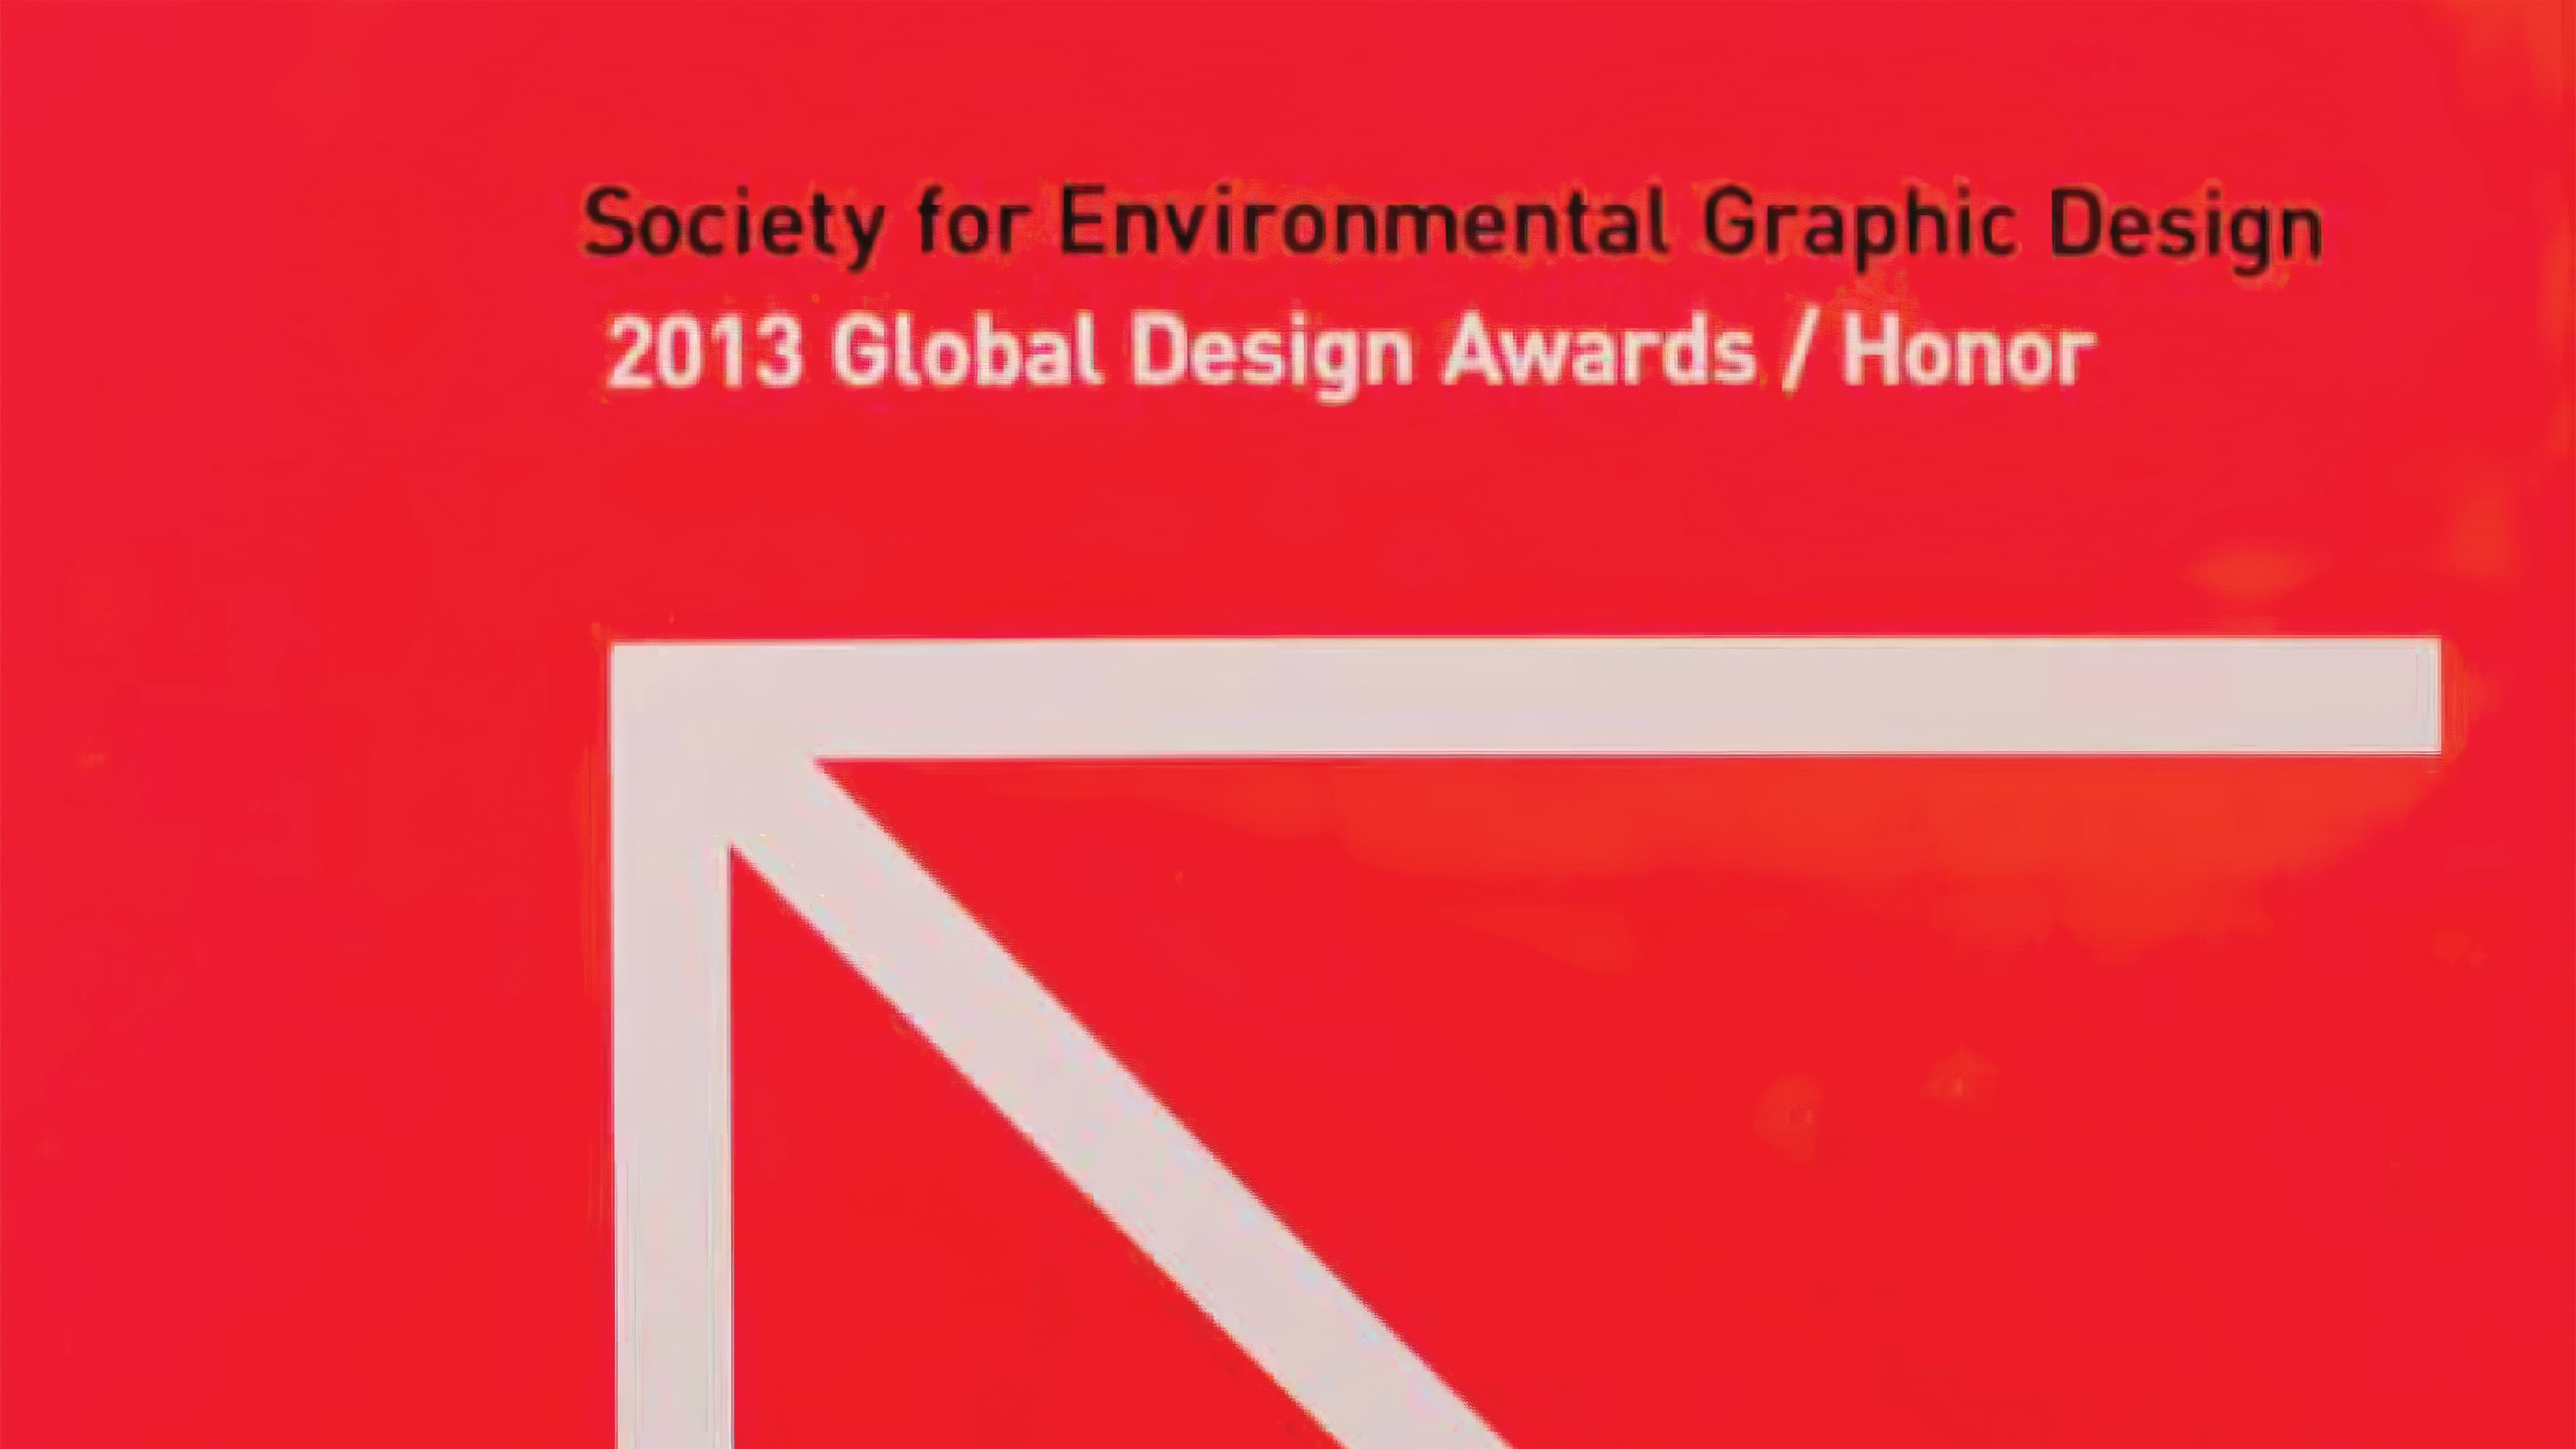 Society for Environmental Graphic Design 2013 Global Design Awards